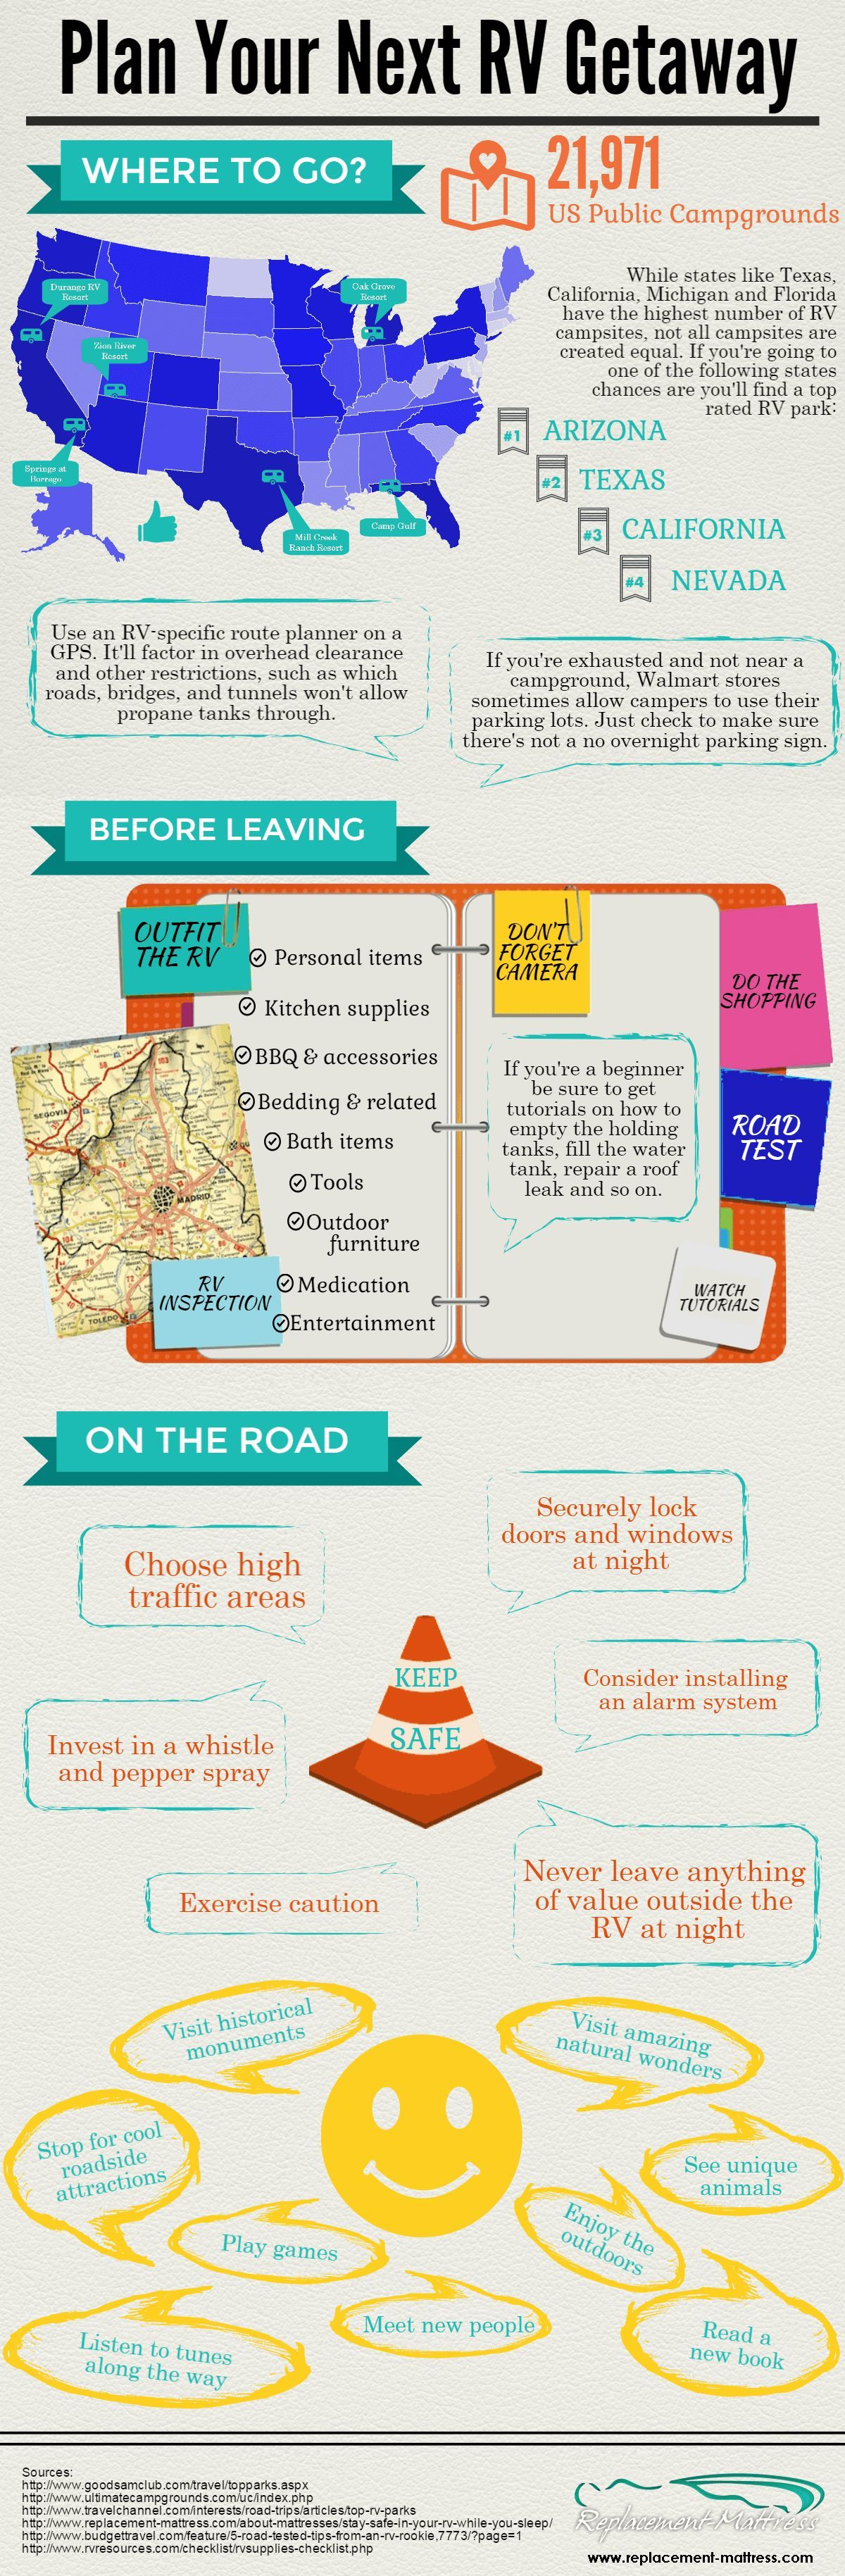 Plan Your RV Getaway ReplacementMattress.com Infographic